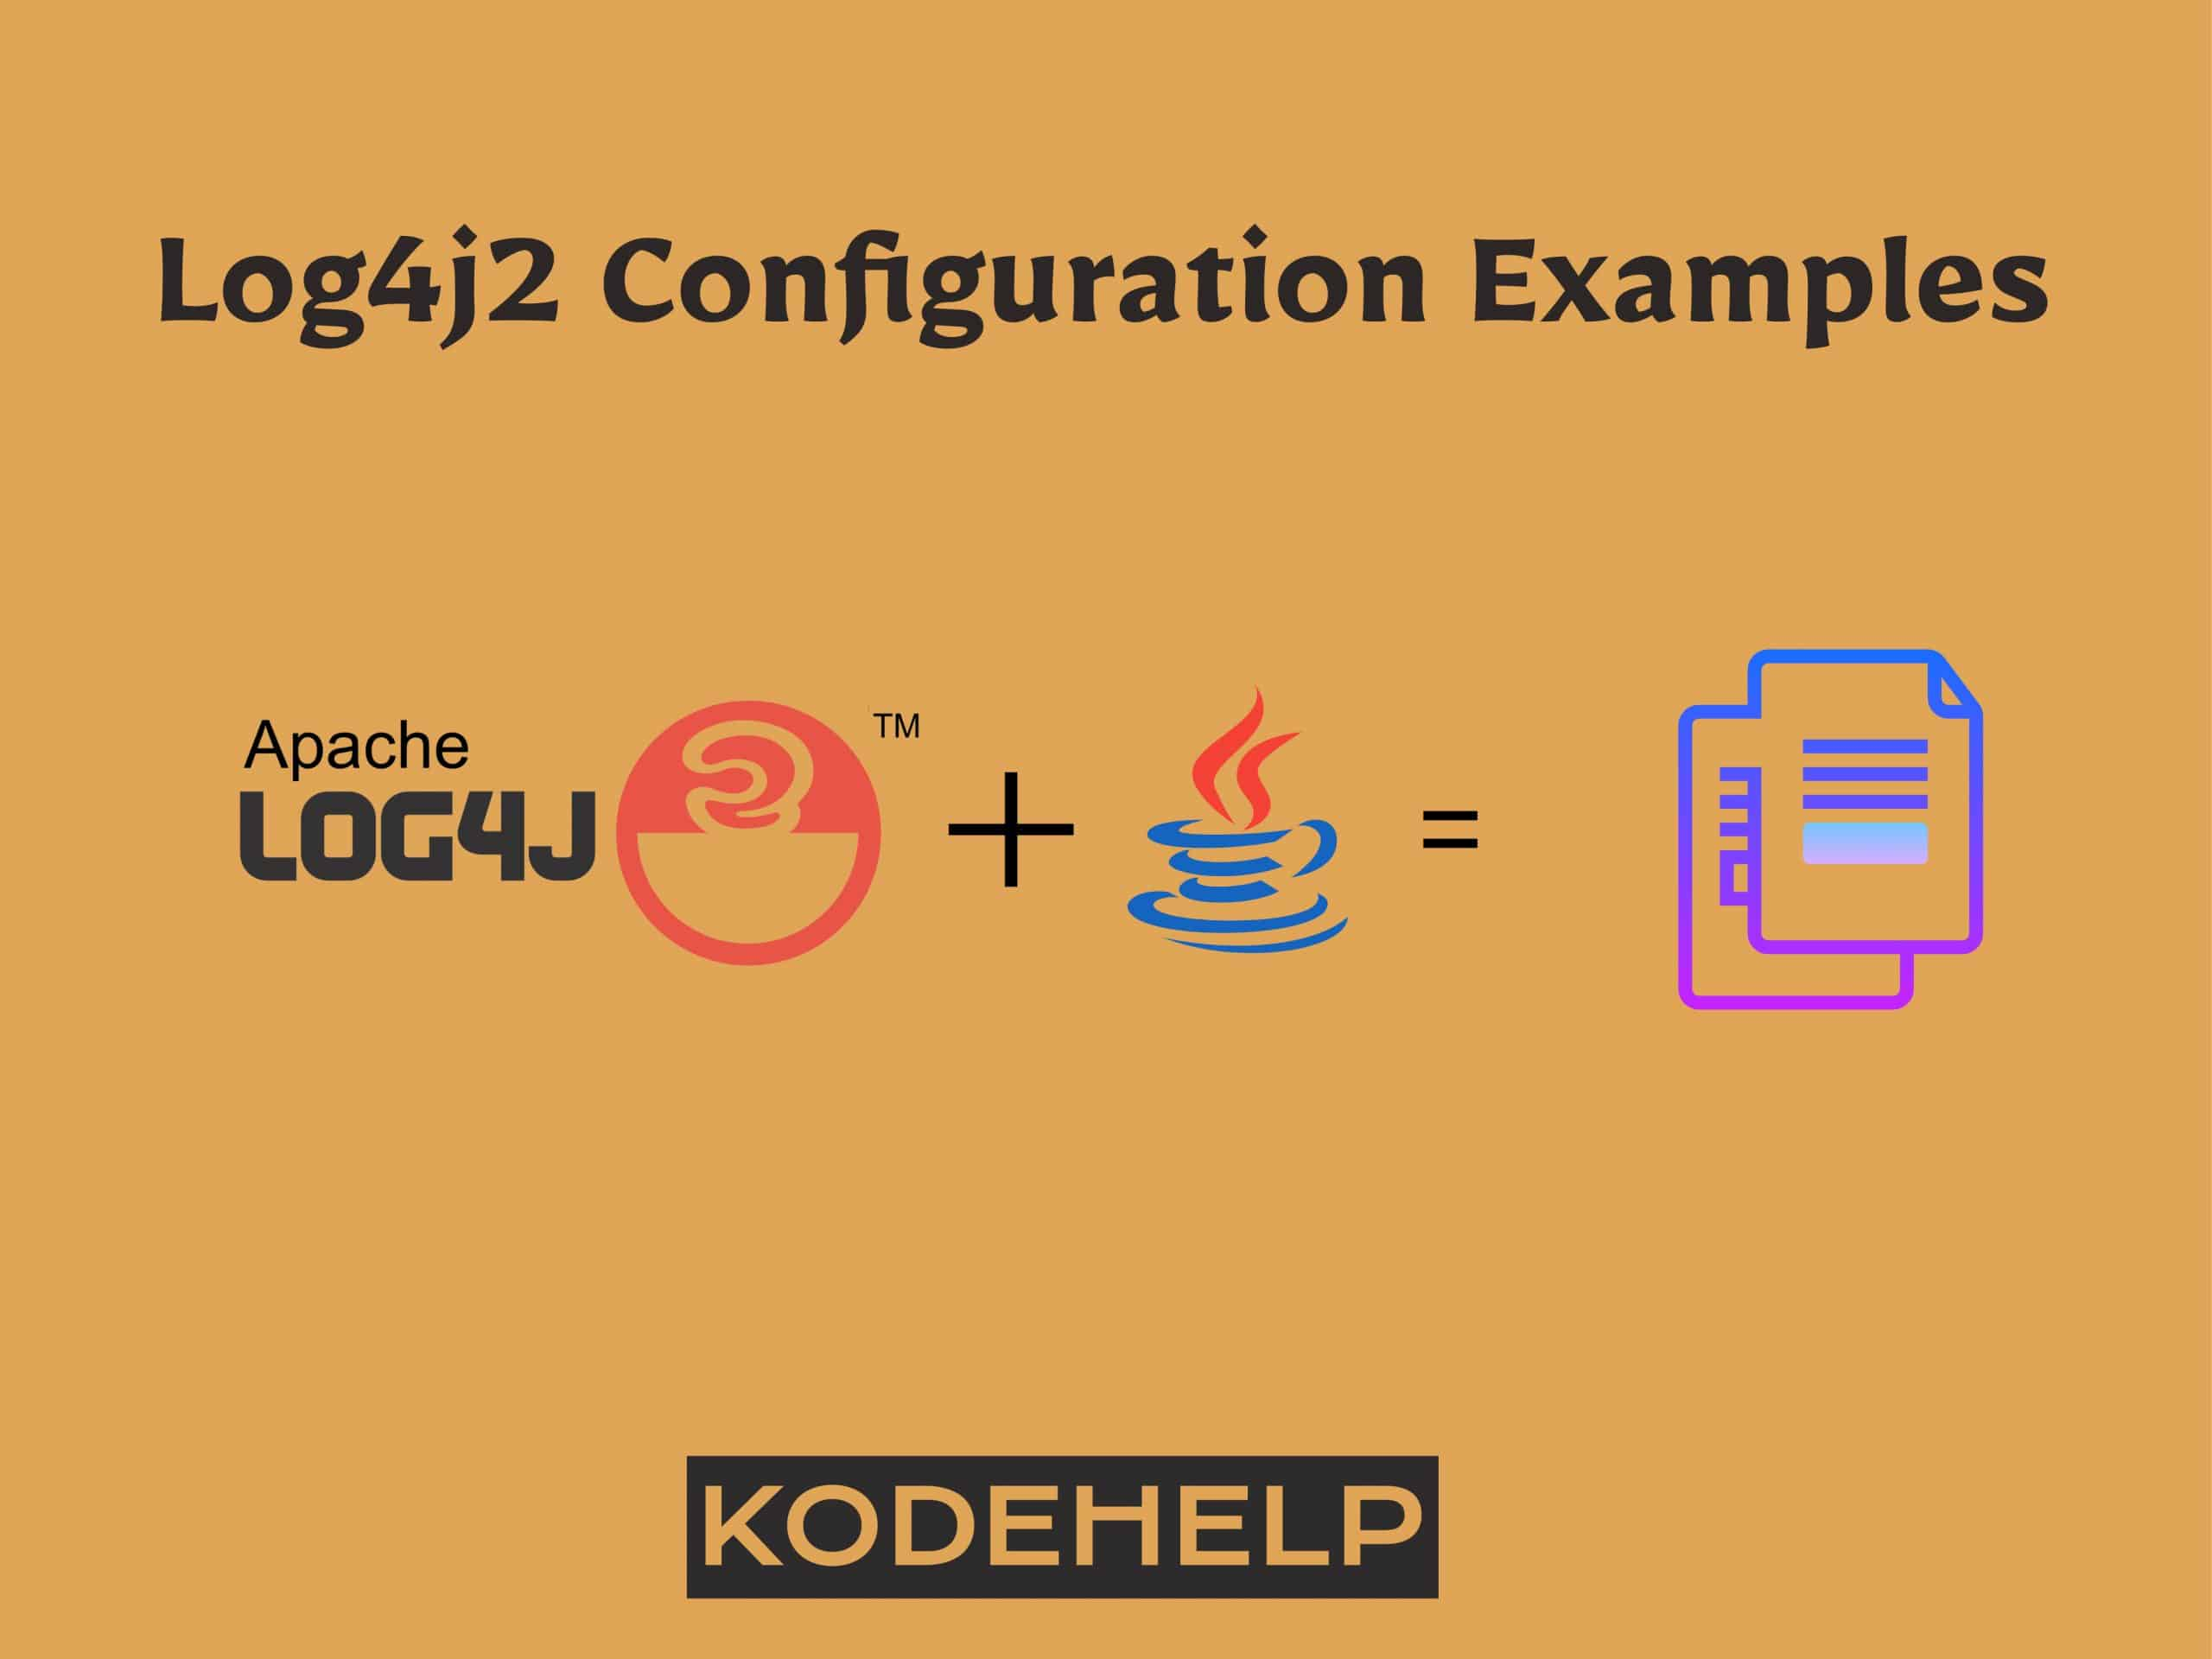 Log4j2 Configuration Example